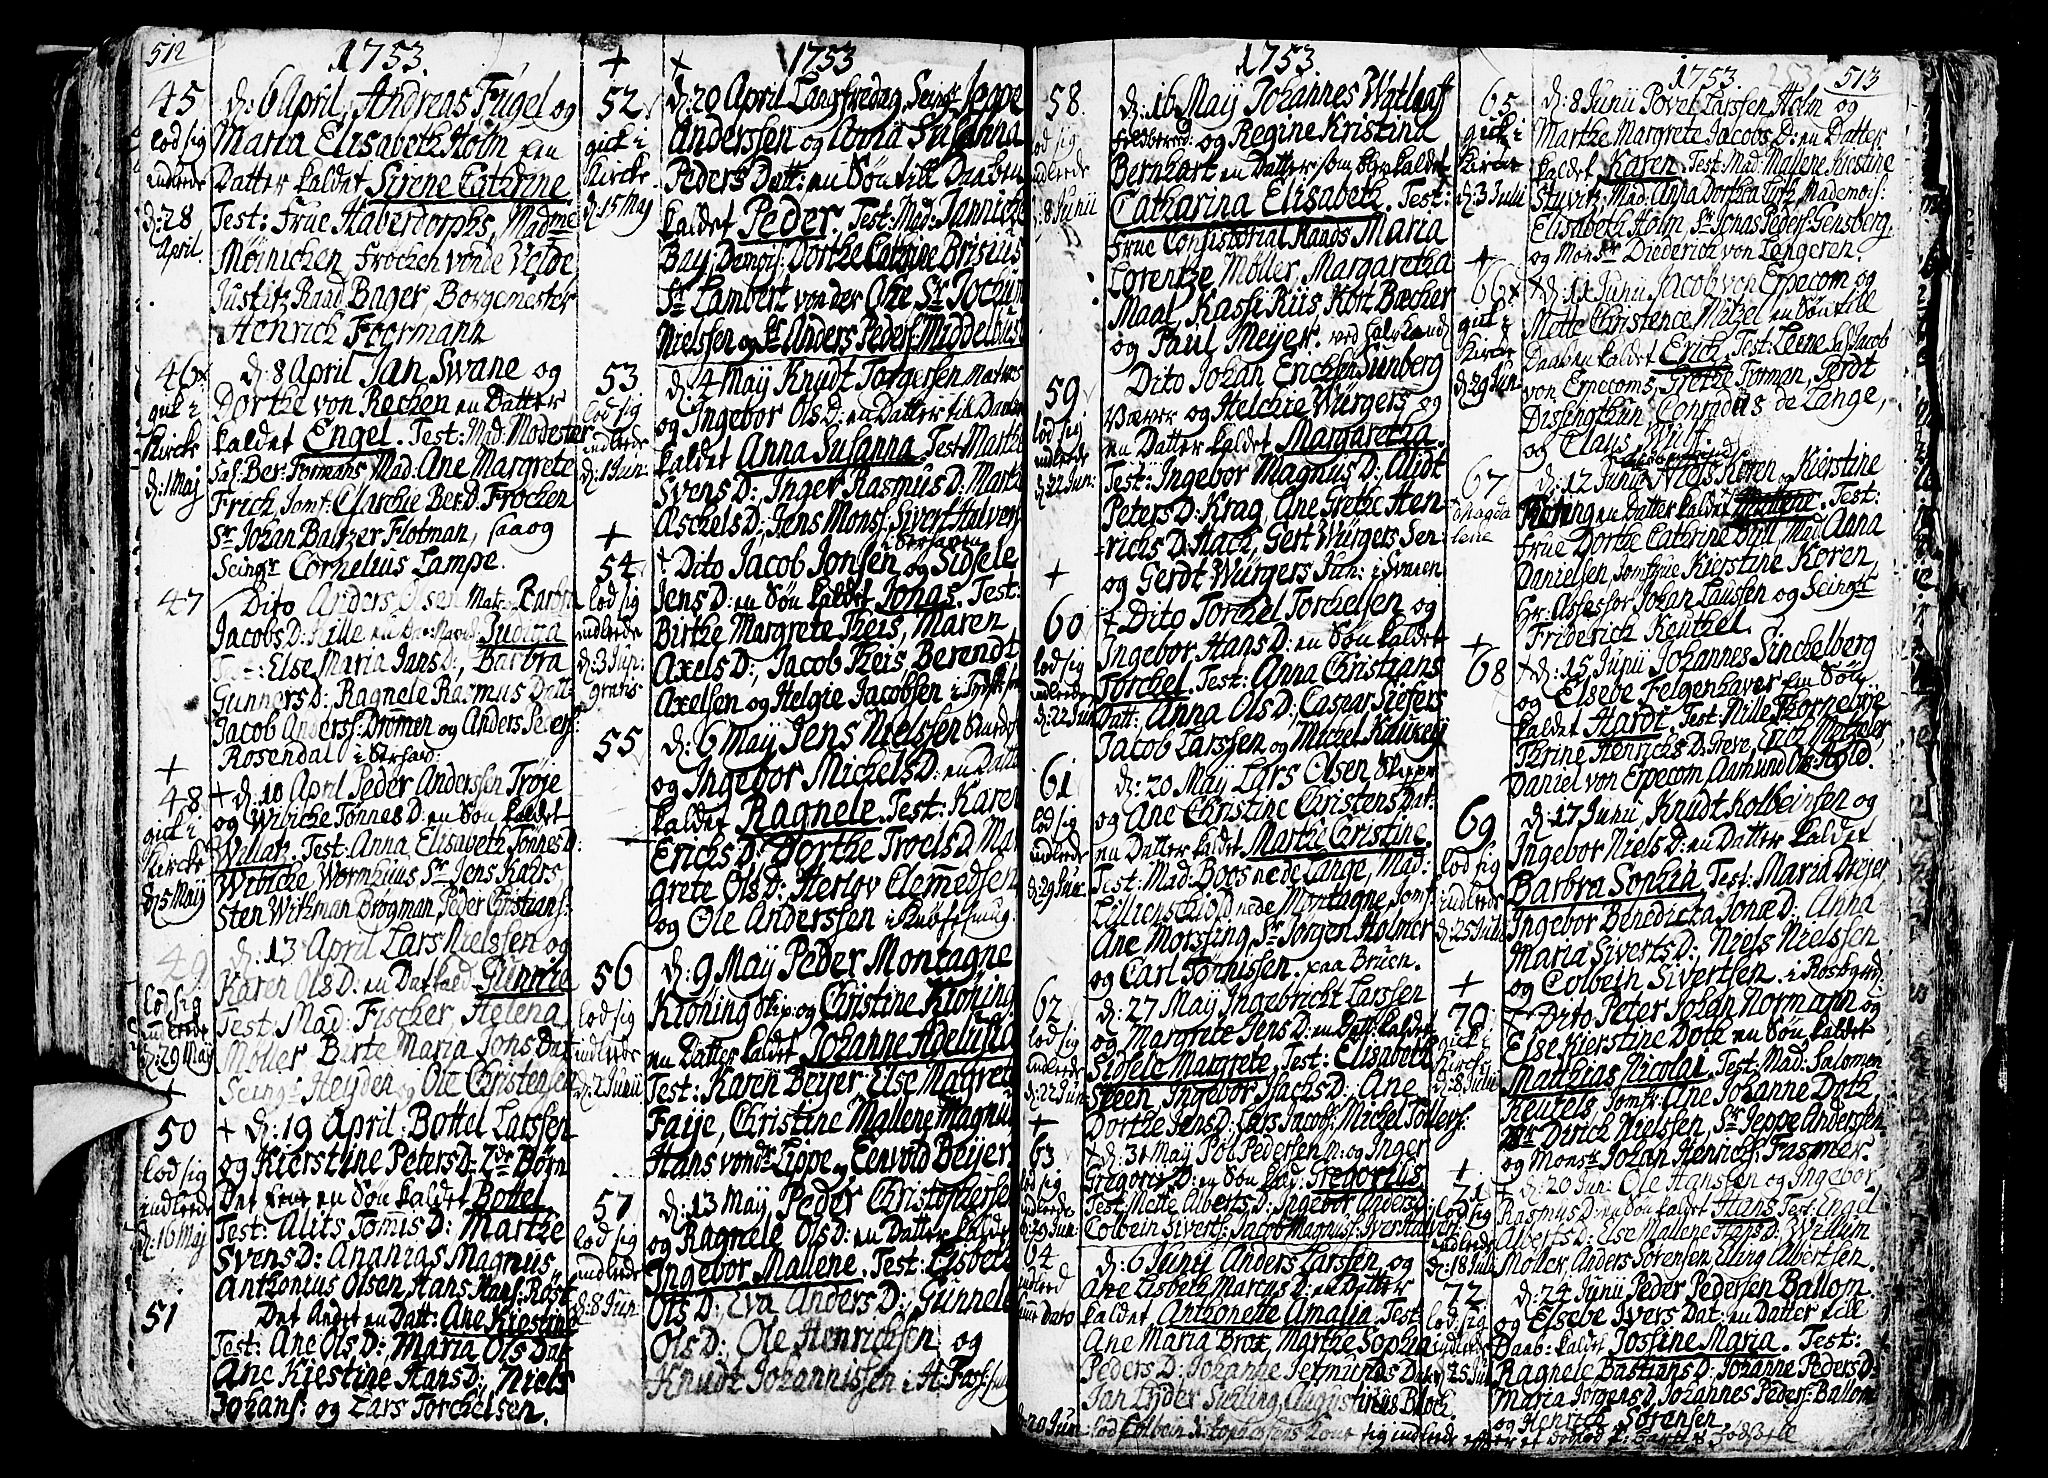 SAB, Nykirken Sokneprestembete, H/Haa: Ministerialbok nr. A 3, 1717-1764, s. 253